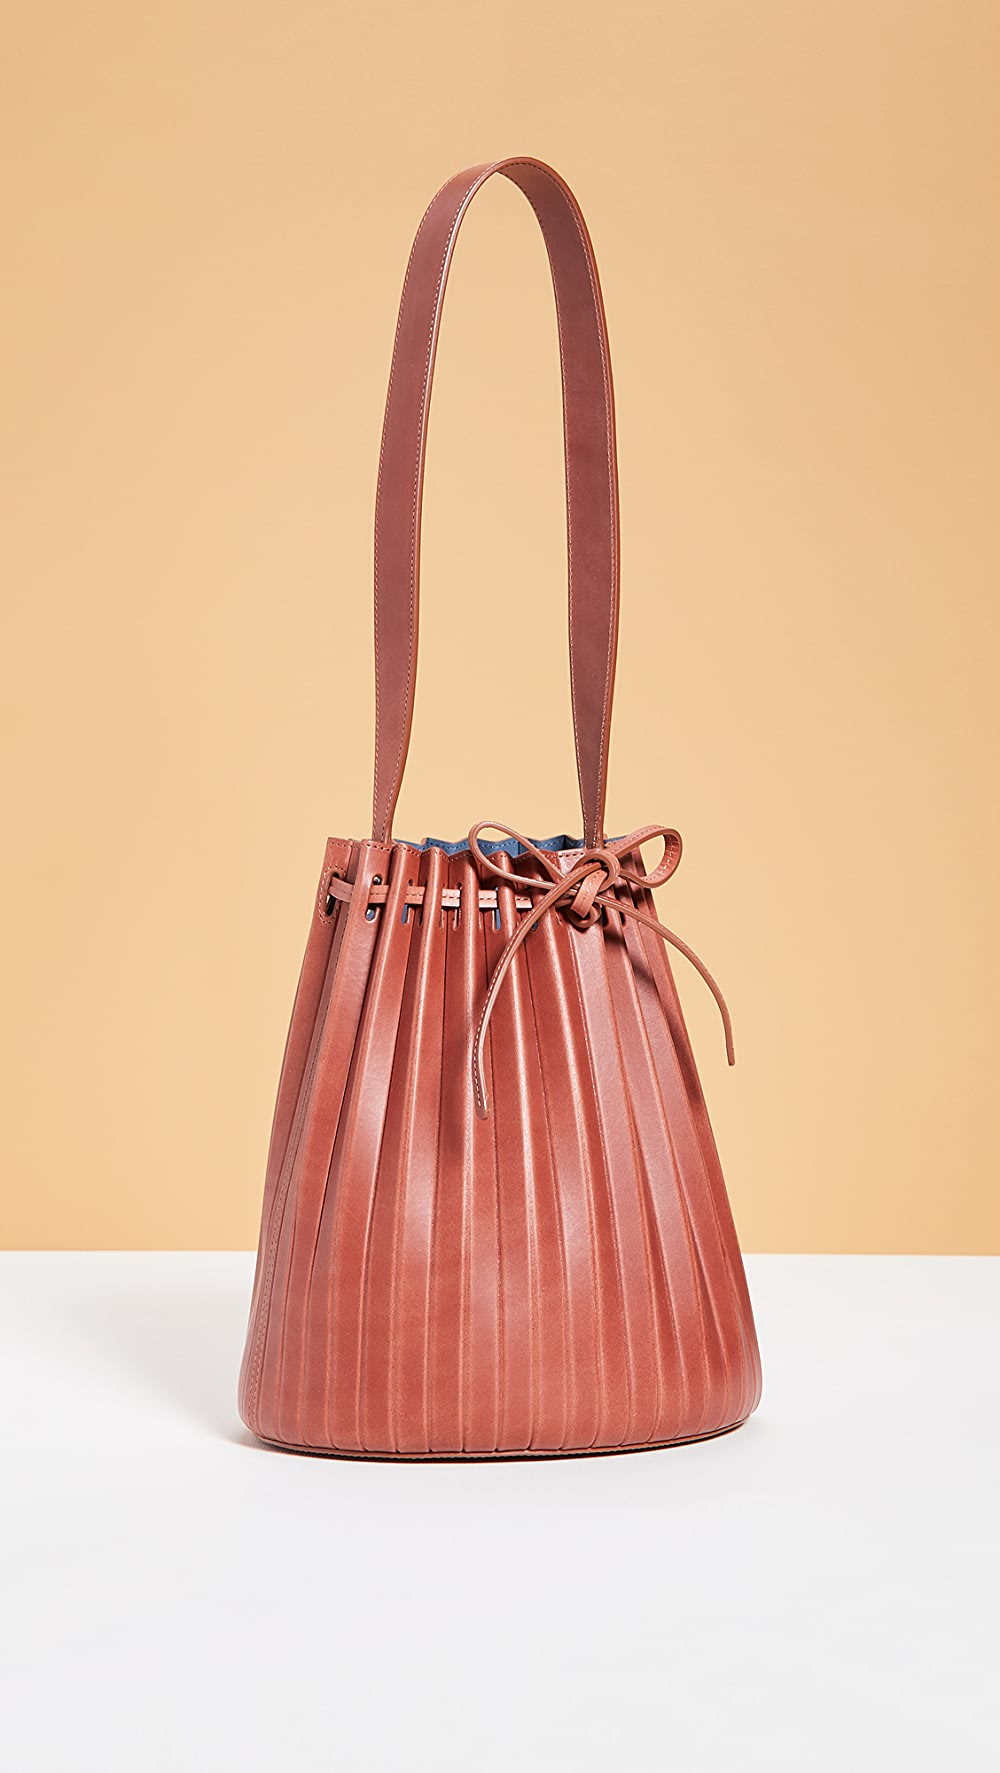 2019 Latest Design Mansur Gavriel - Pleated Bucket Bag Buy One Get One Free